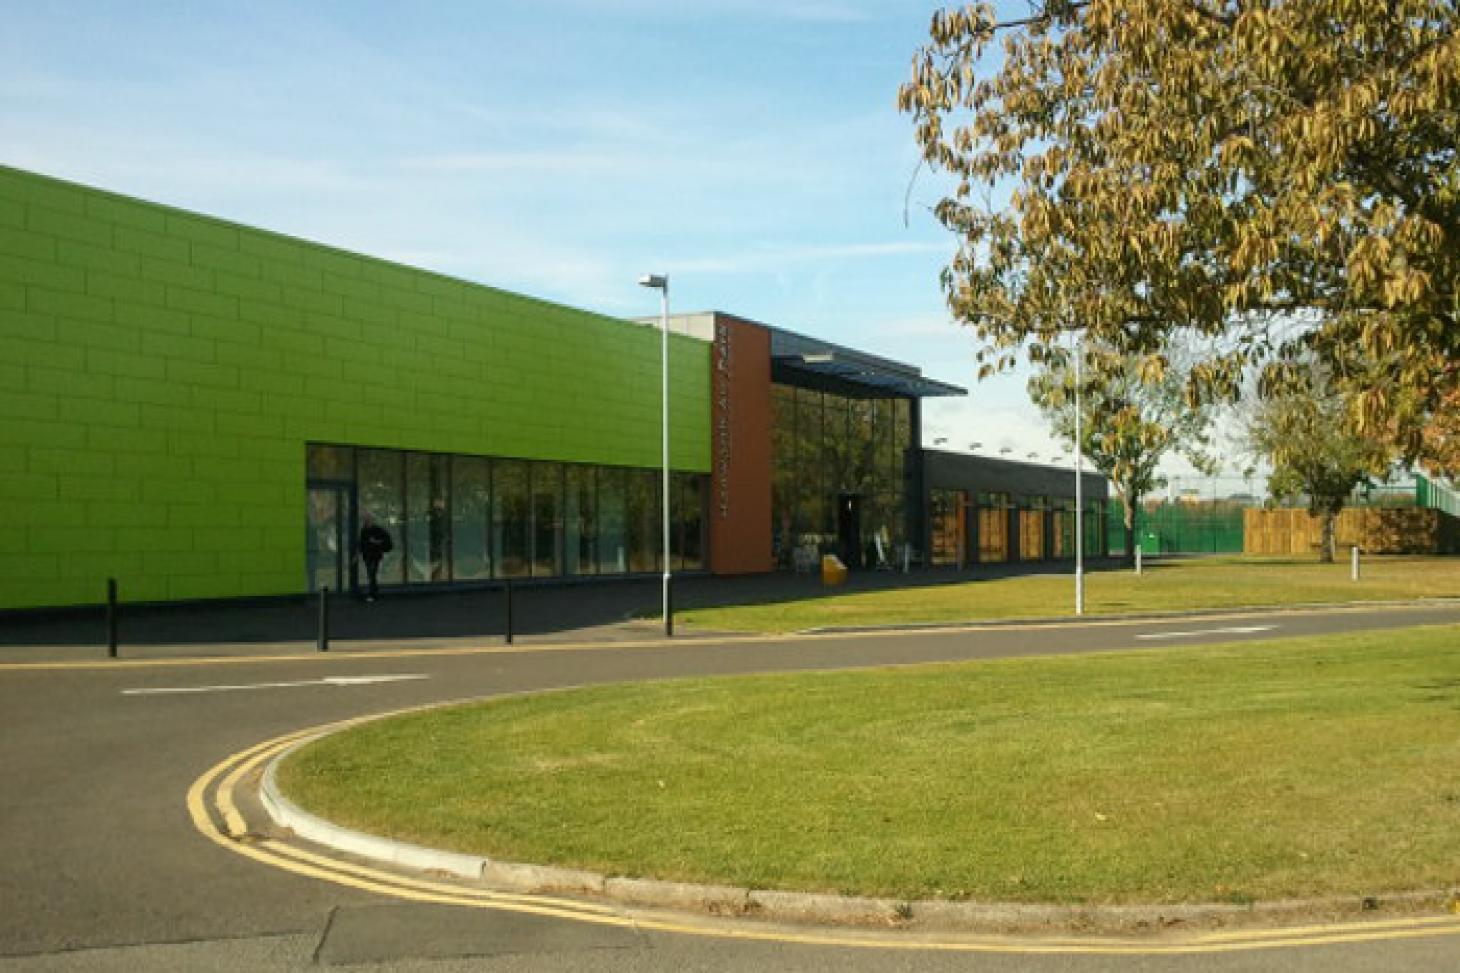 Hanworth Air Park Leisure Centre Outdoor   3G Astroturf netball court